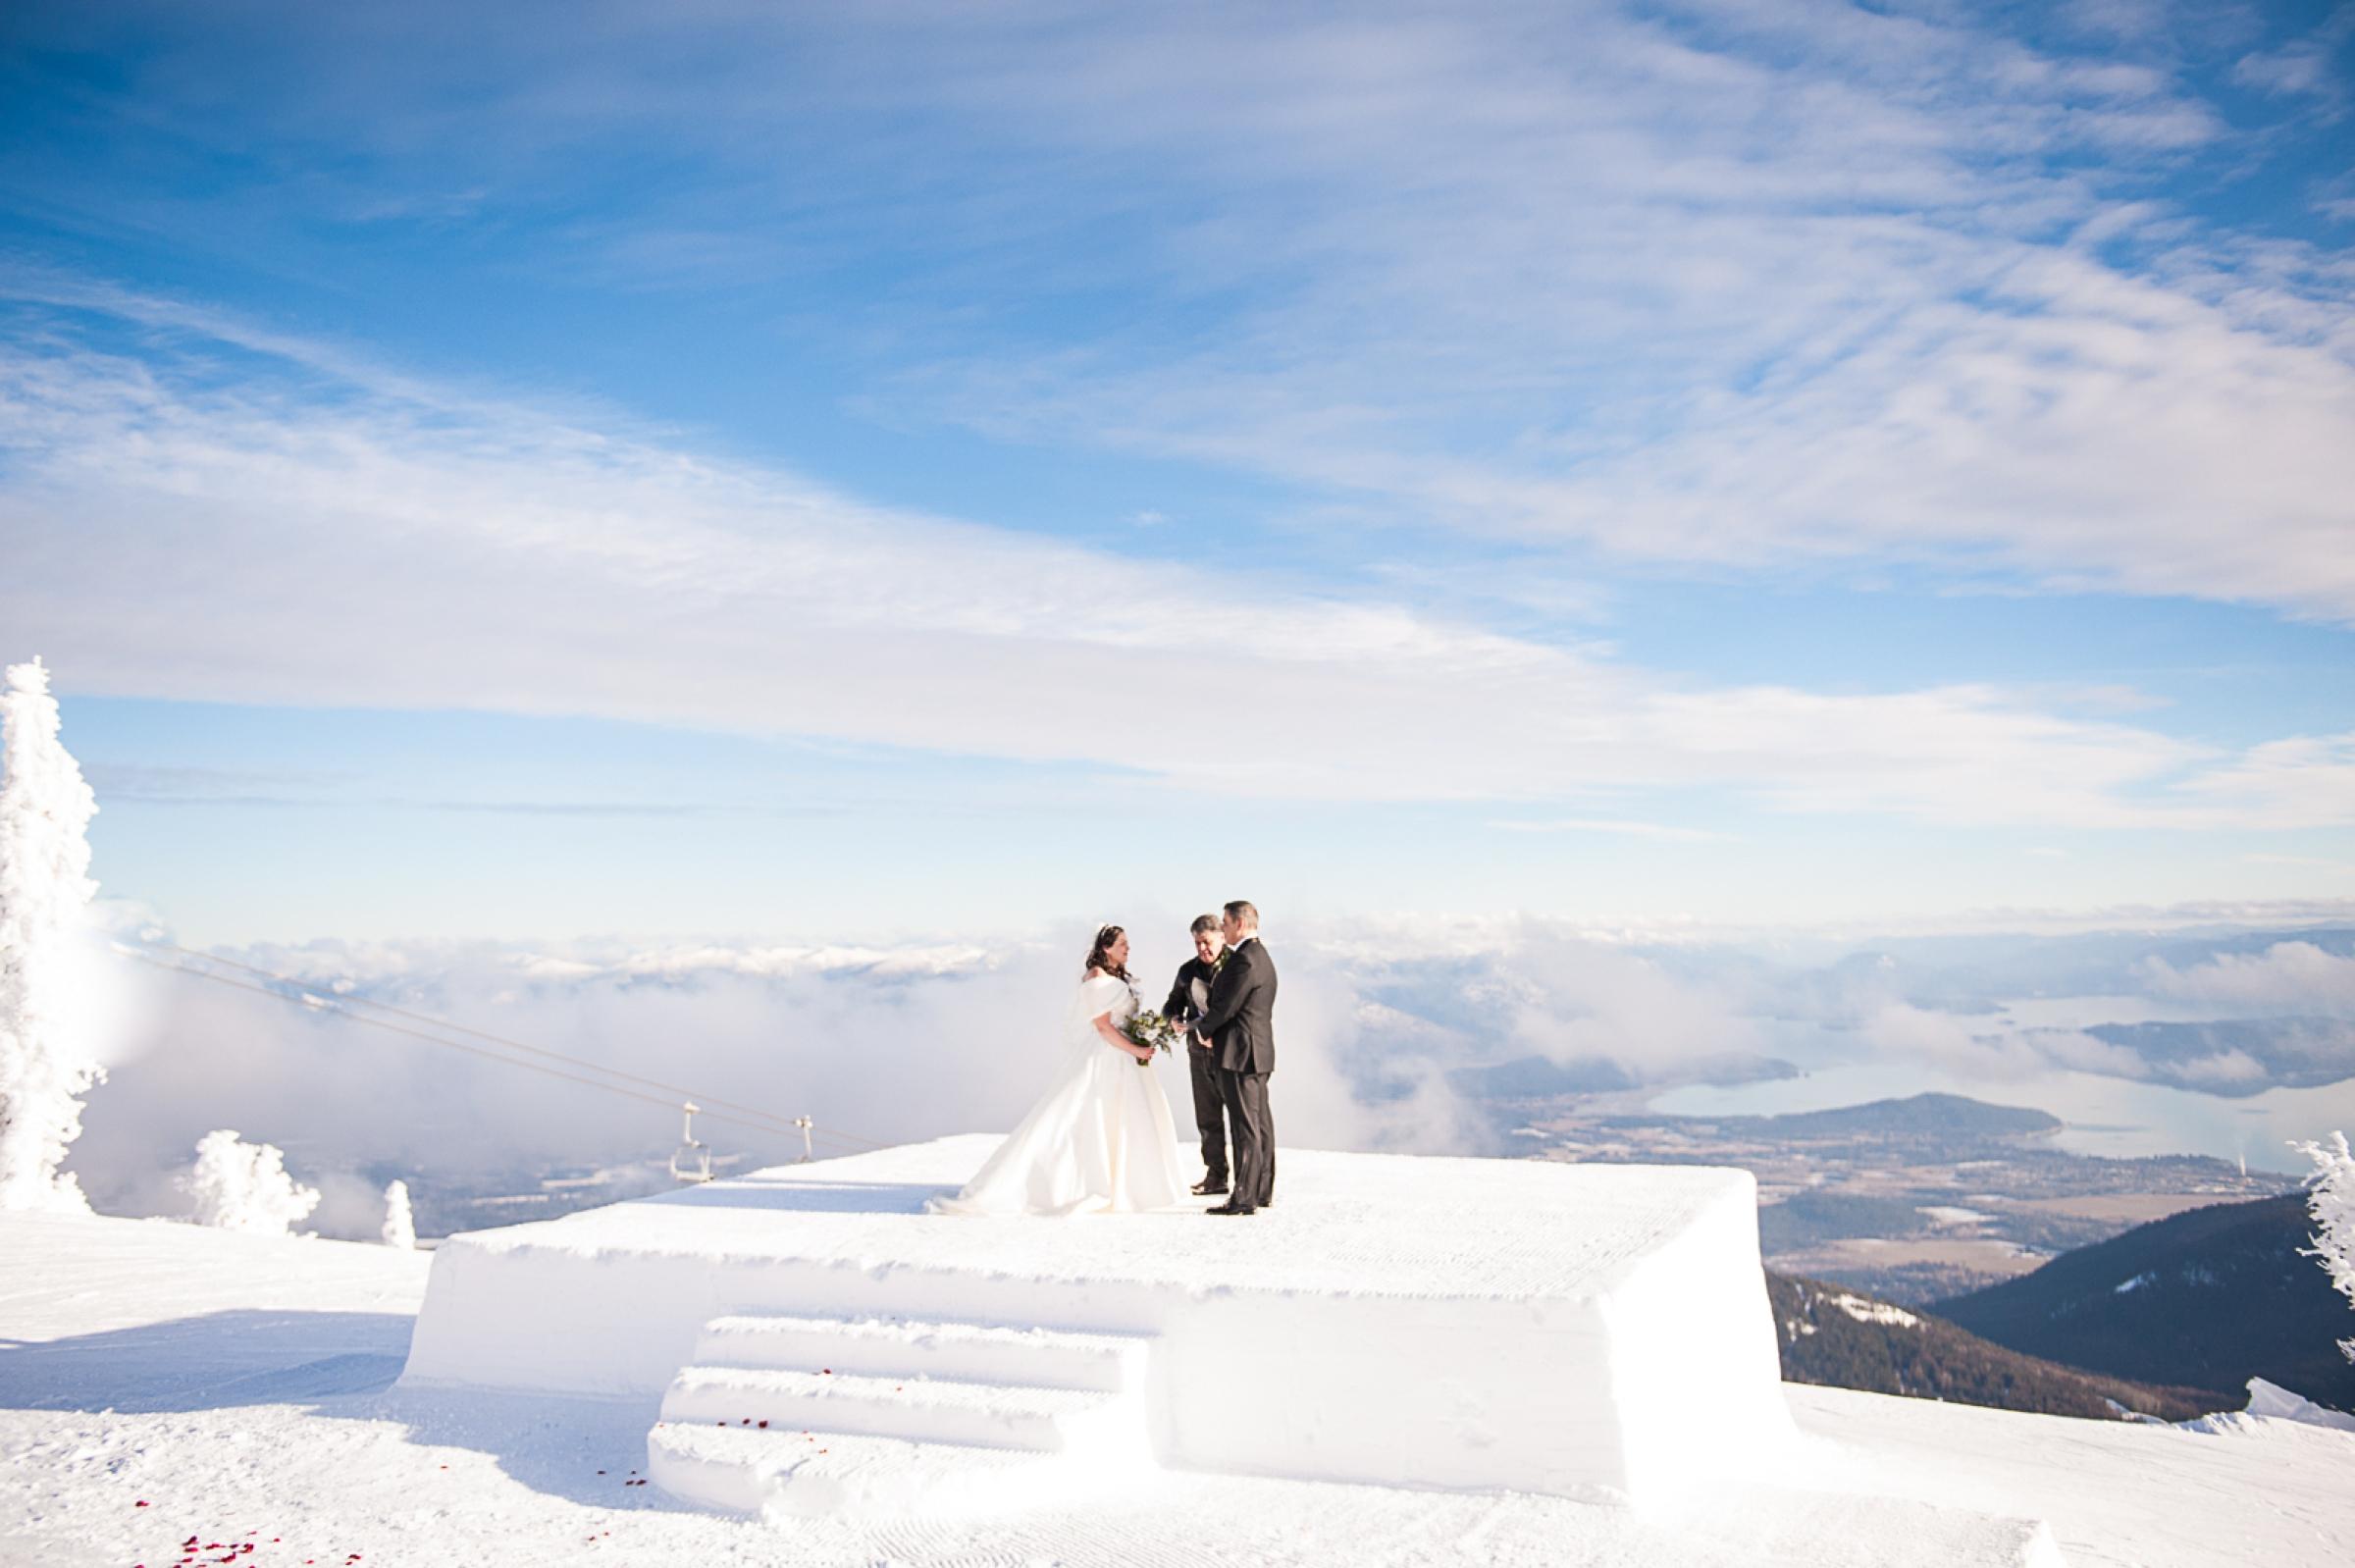 Janel-Gion-Wedding-Photographer-KristinRon-Sandpoint-Idaho.jpg_0012.jpg